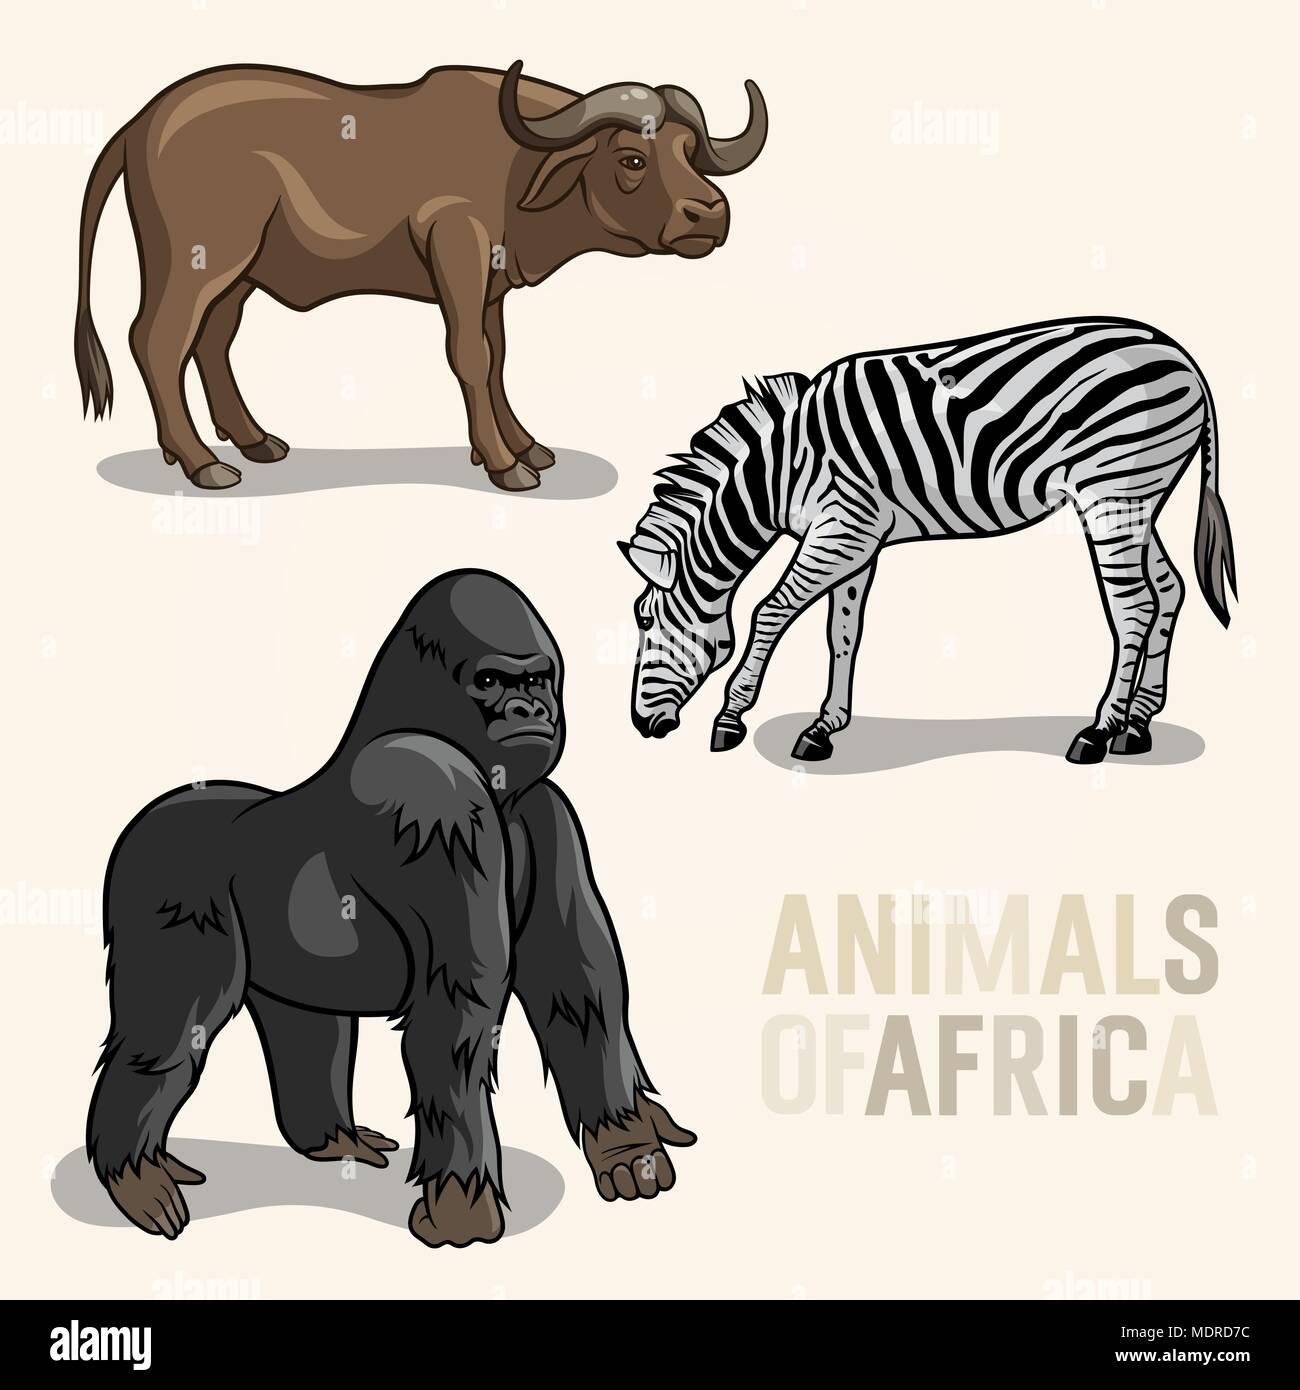 Set de vectores de animales de África. Gorila, Buffalo y zebra Imagen De Stock